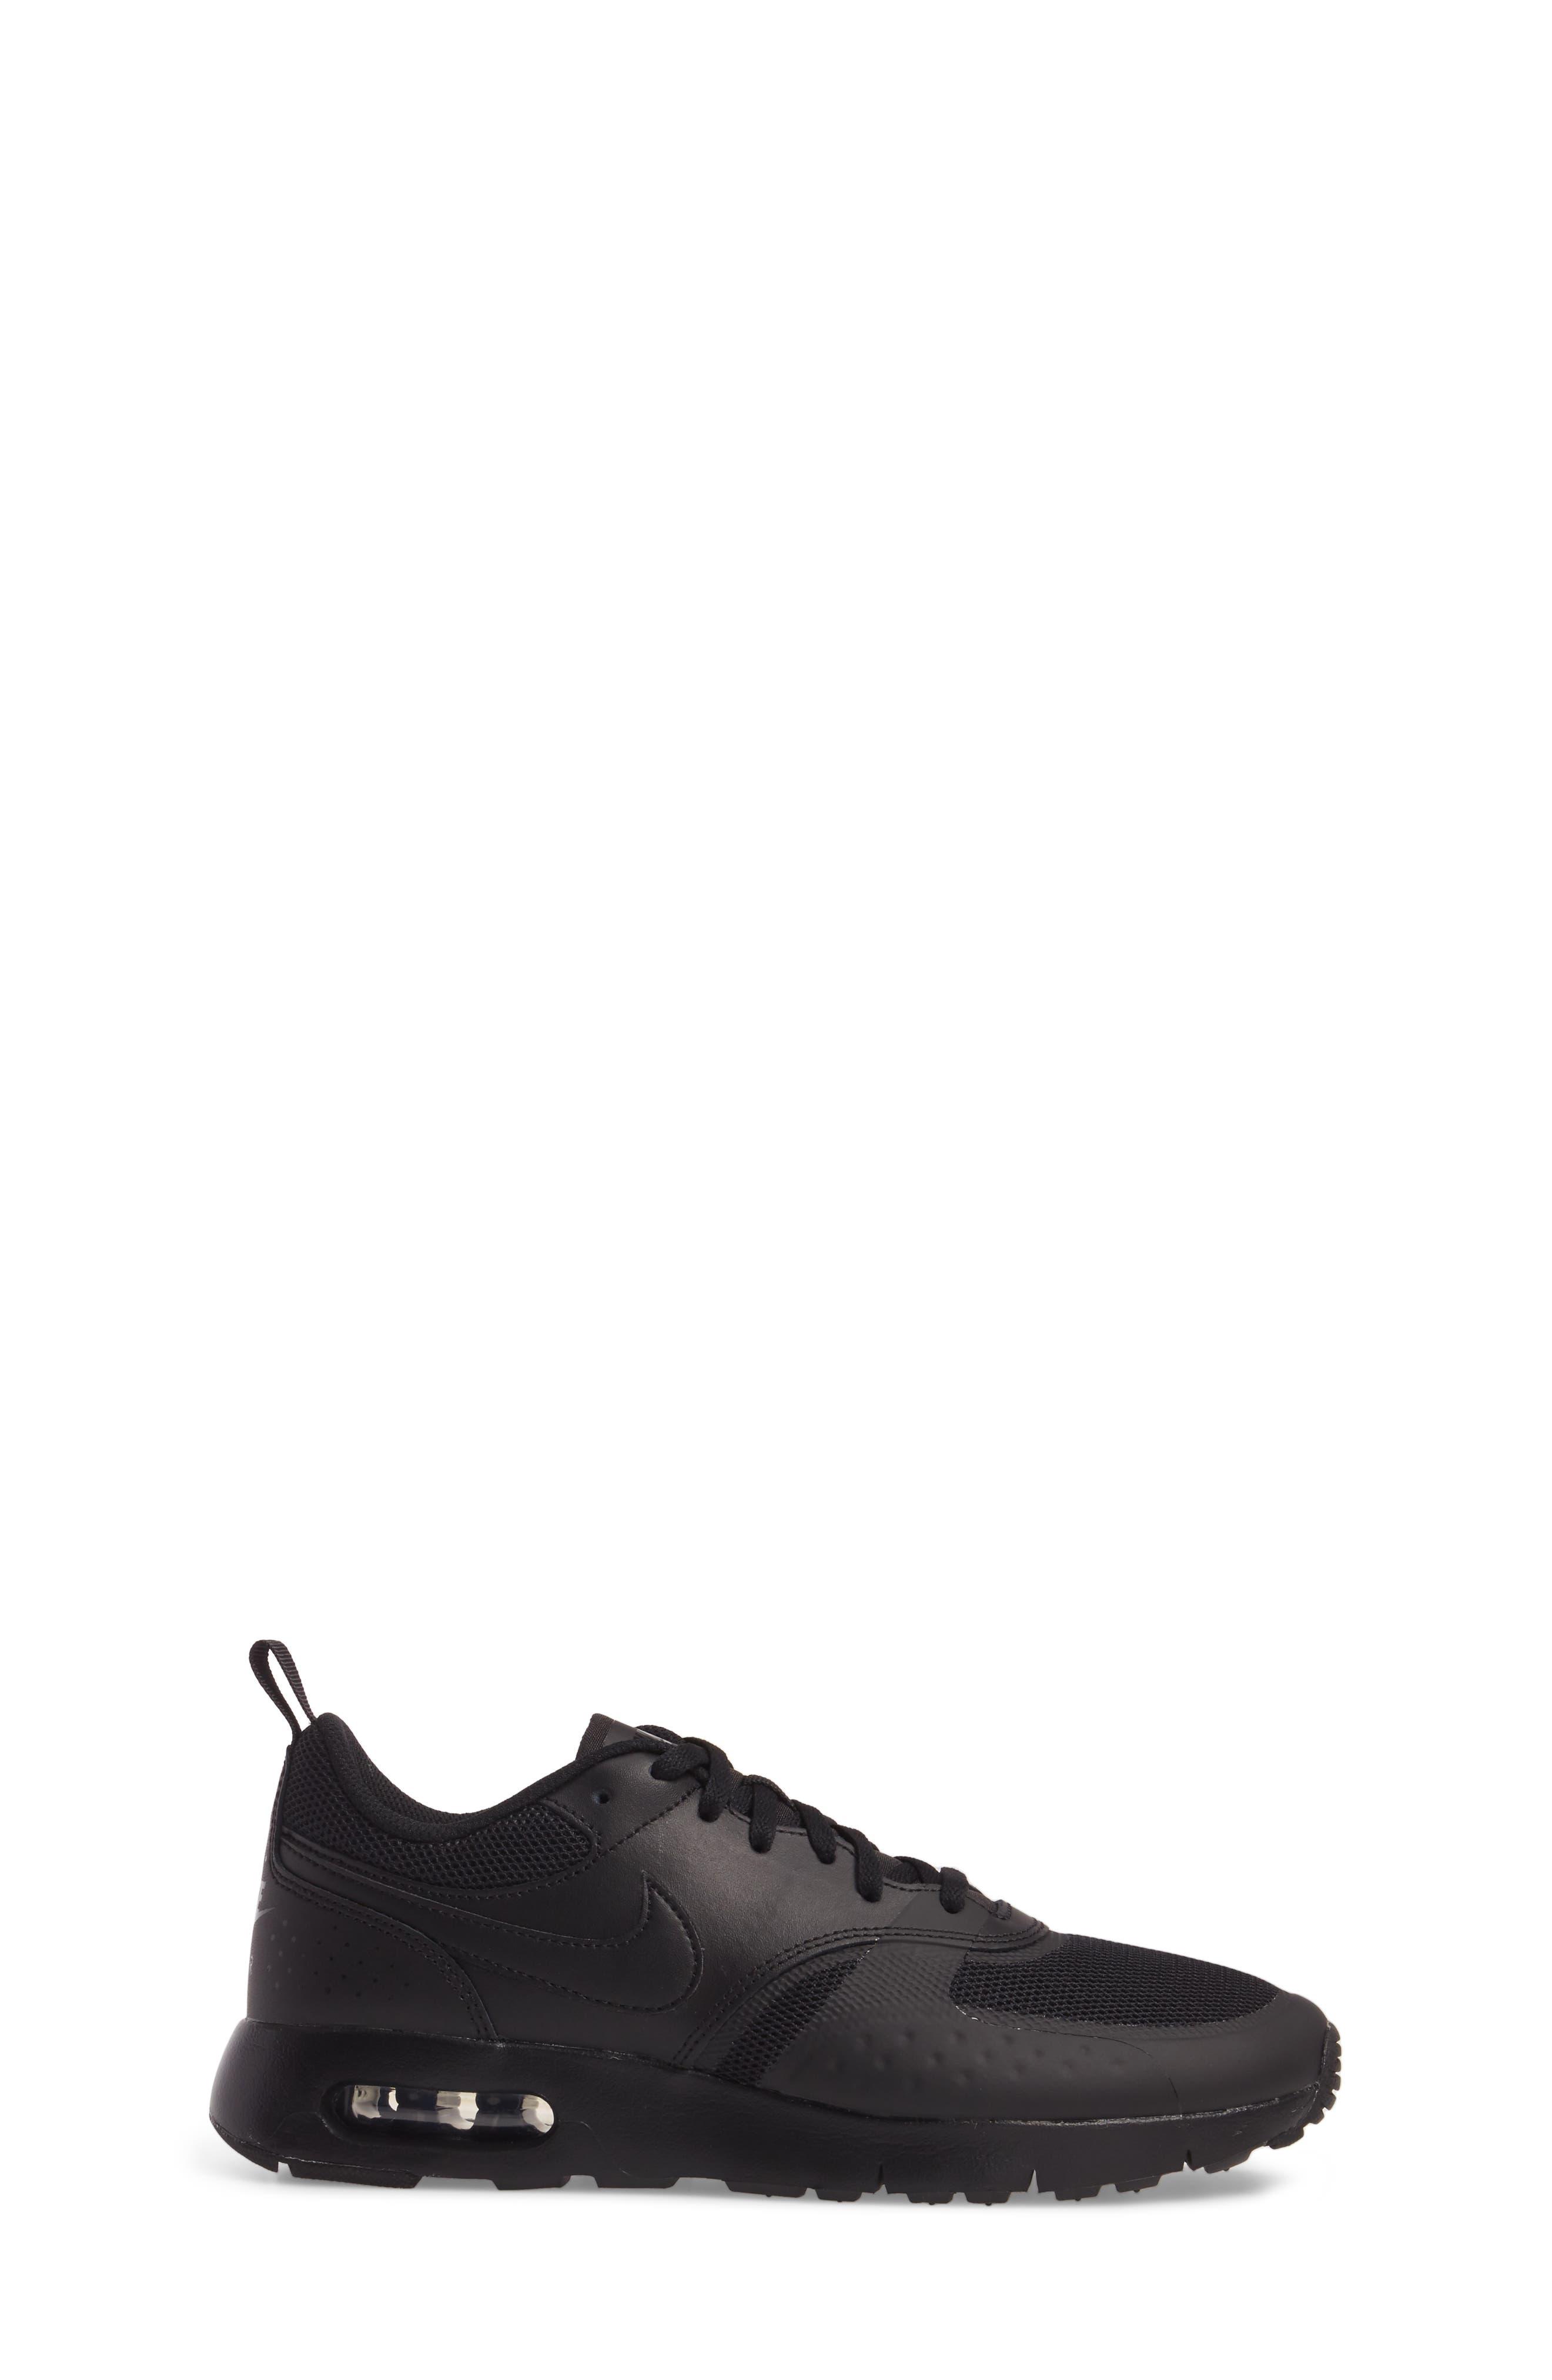 Air Max Vision Sneaker,                             Alternate thumbnail 3, color,                             Black